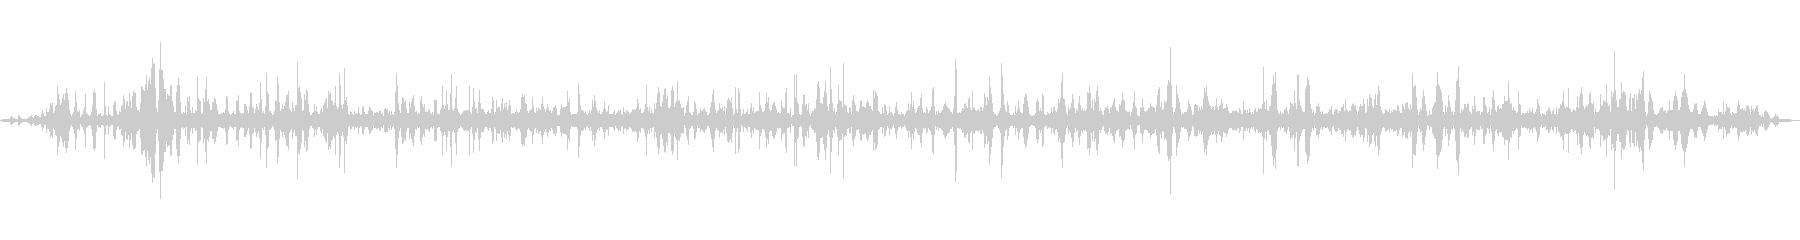 [ASMR]波打ち際の音_003の未再生の波形